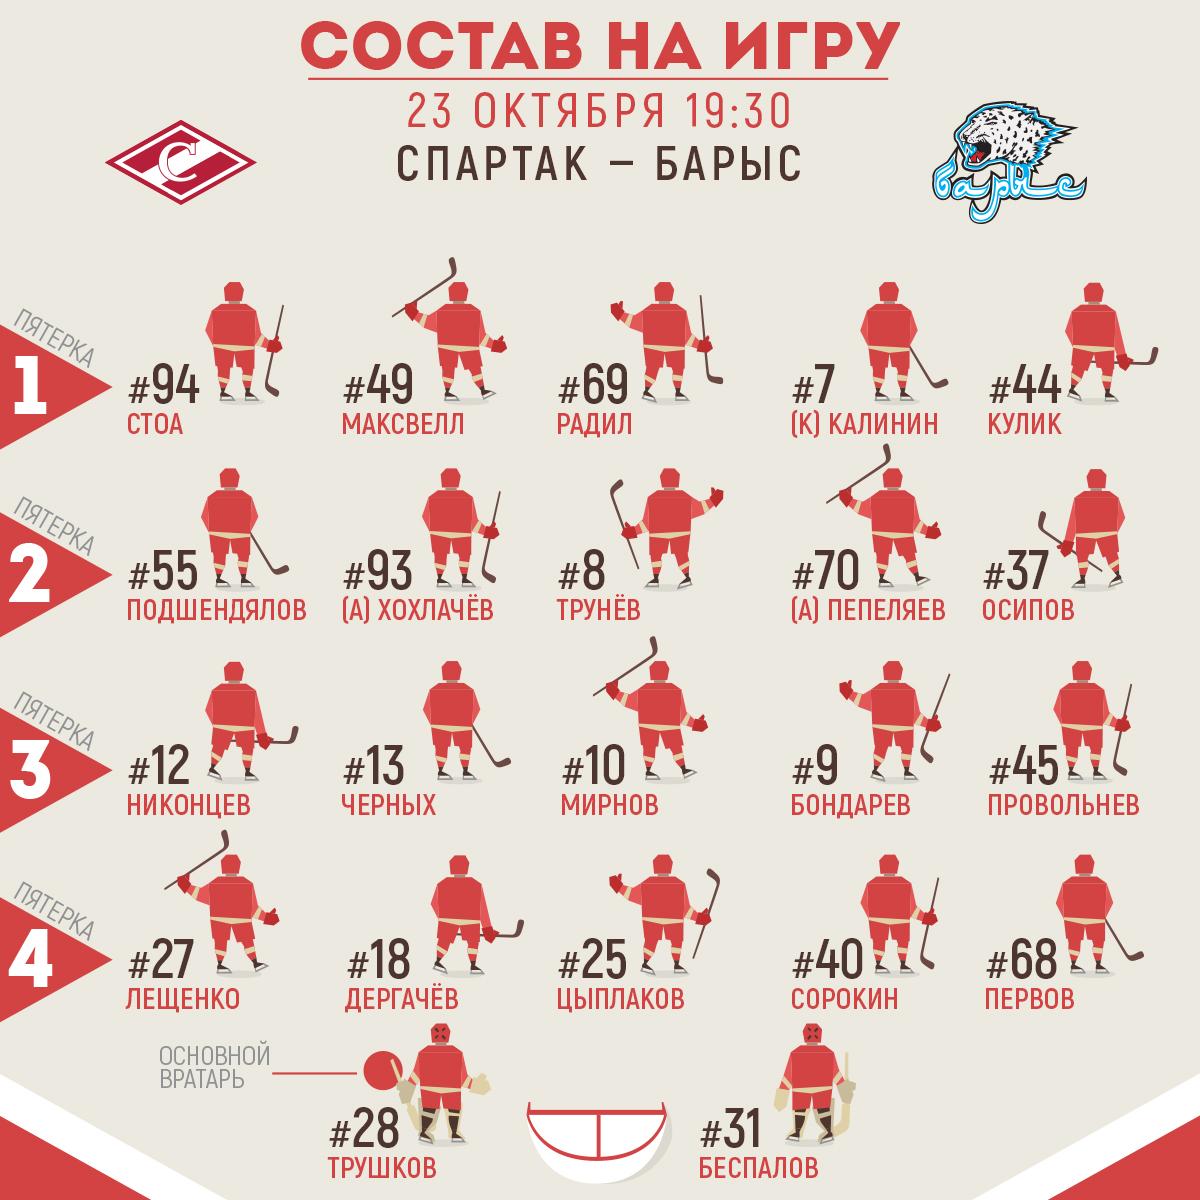 Состав «Спартака» на матч с «Барысом»